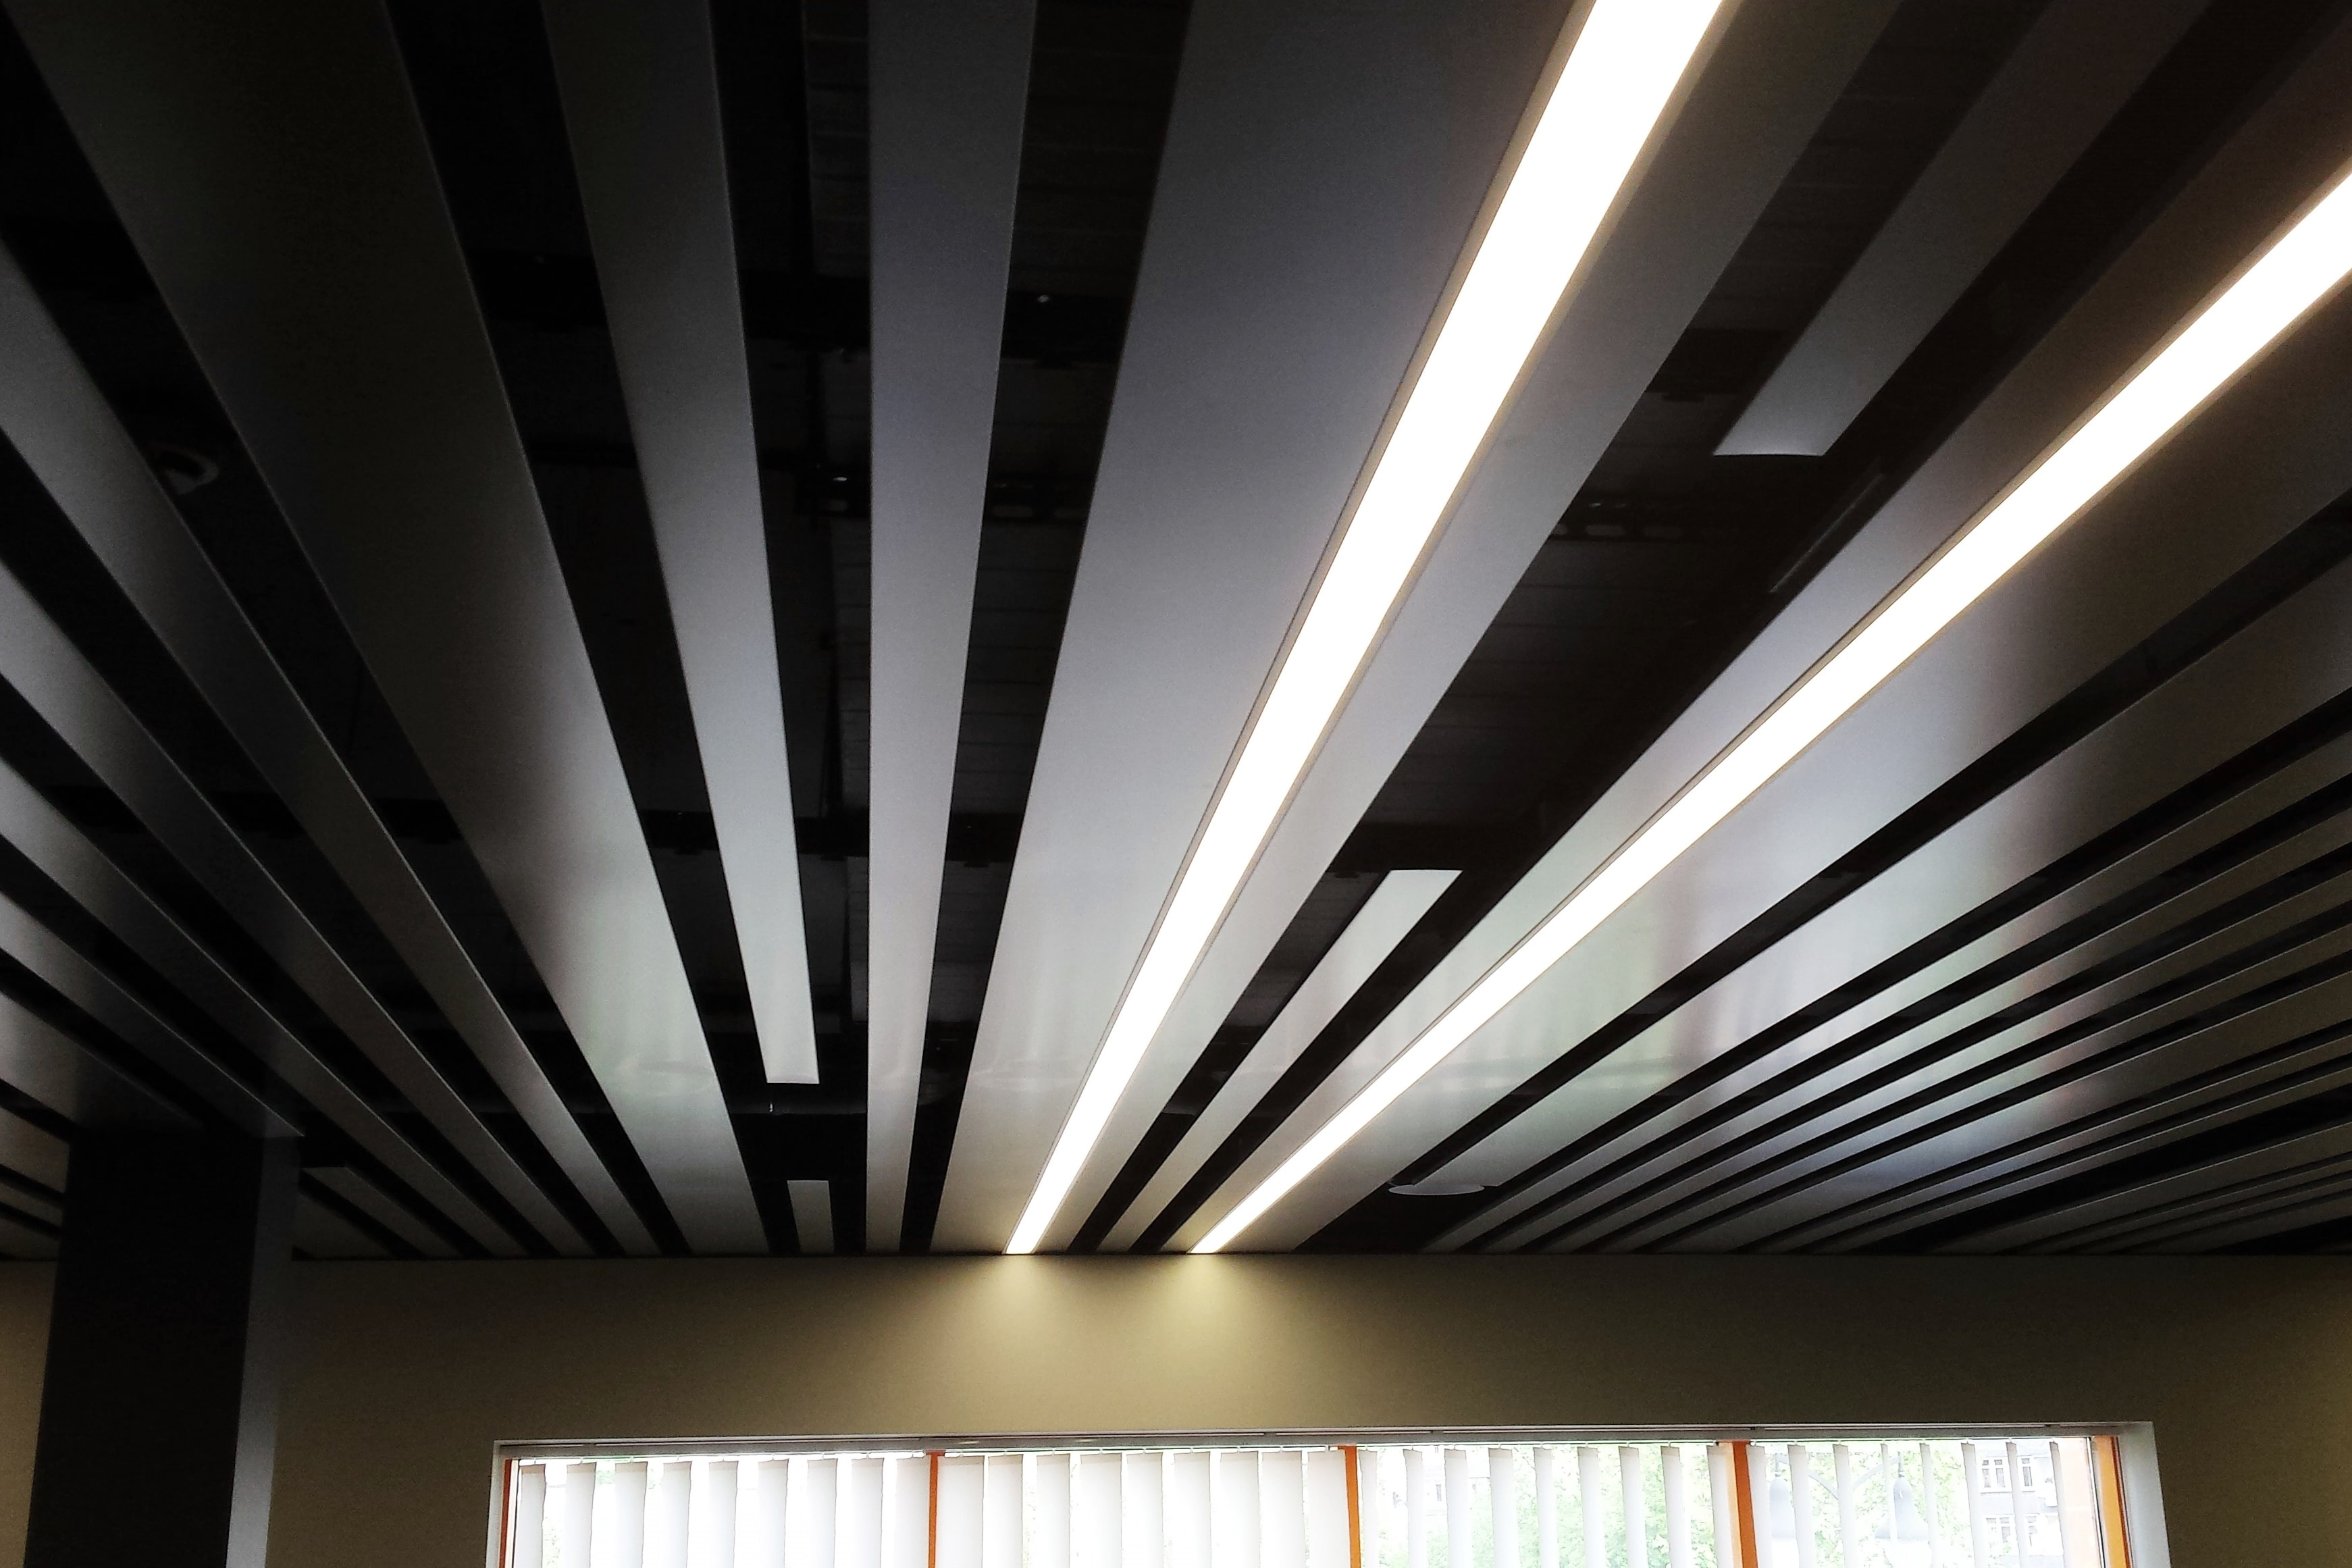 r_215_Serpens-LED-LT-Vilnius-1505-05r-min